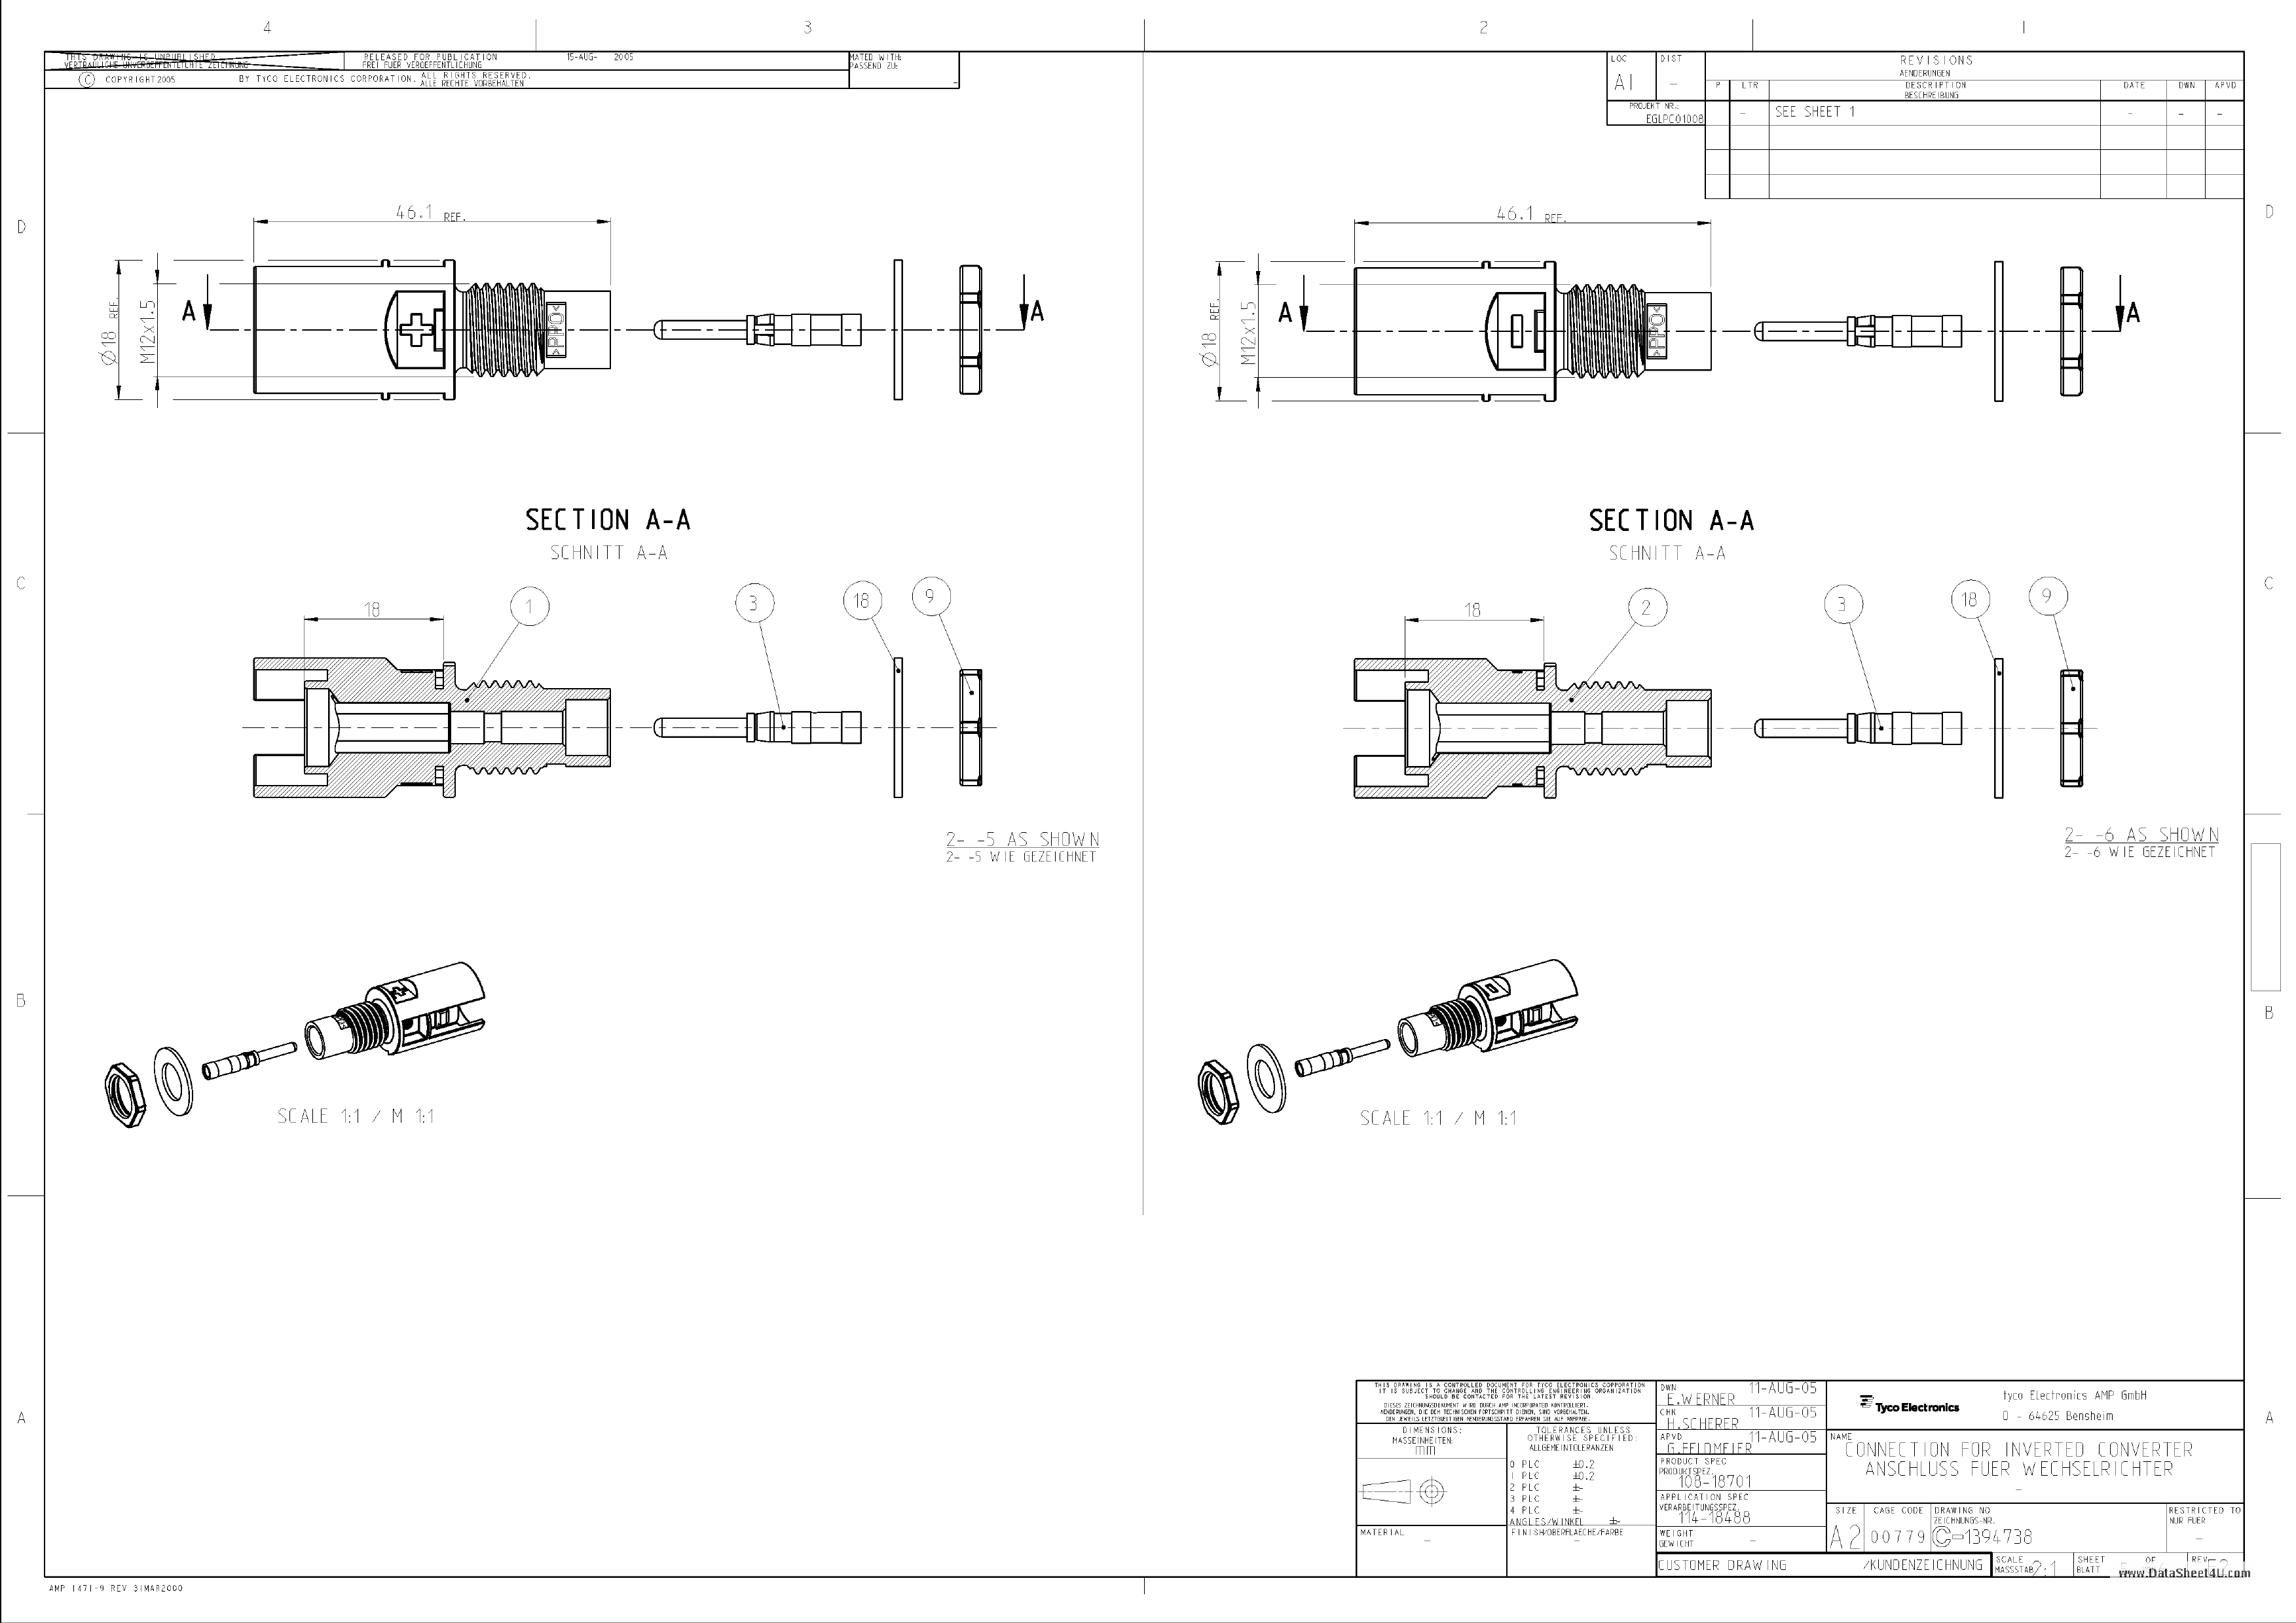 C-1394738 pdf